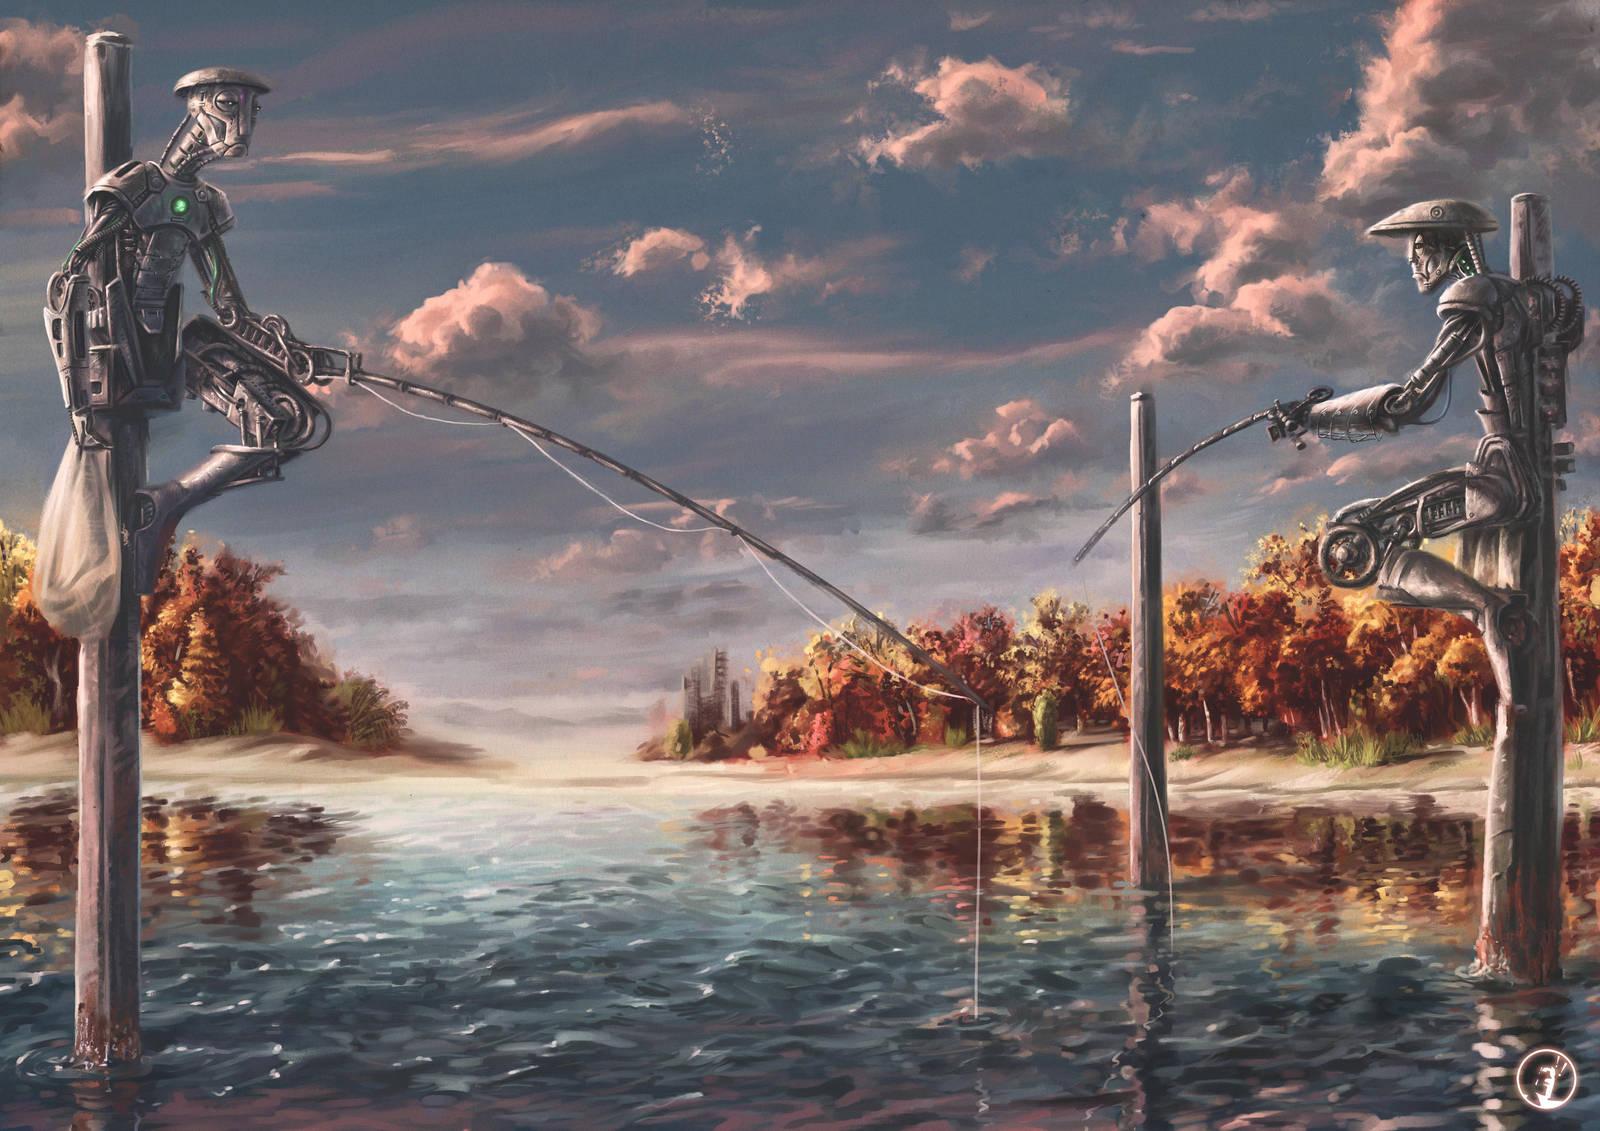 The Fishermen by ISignRob